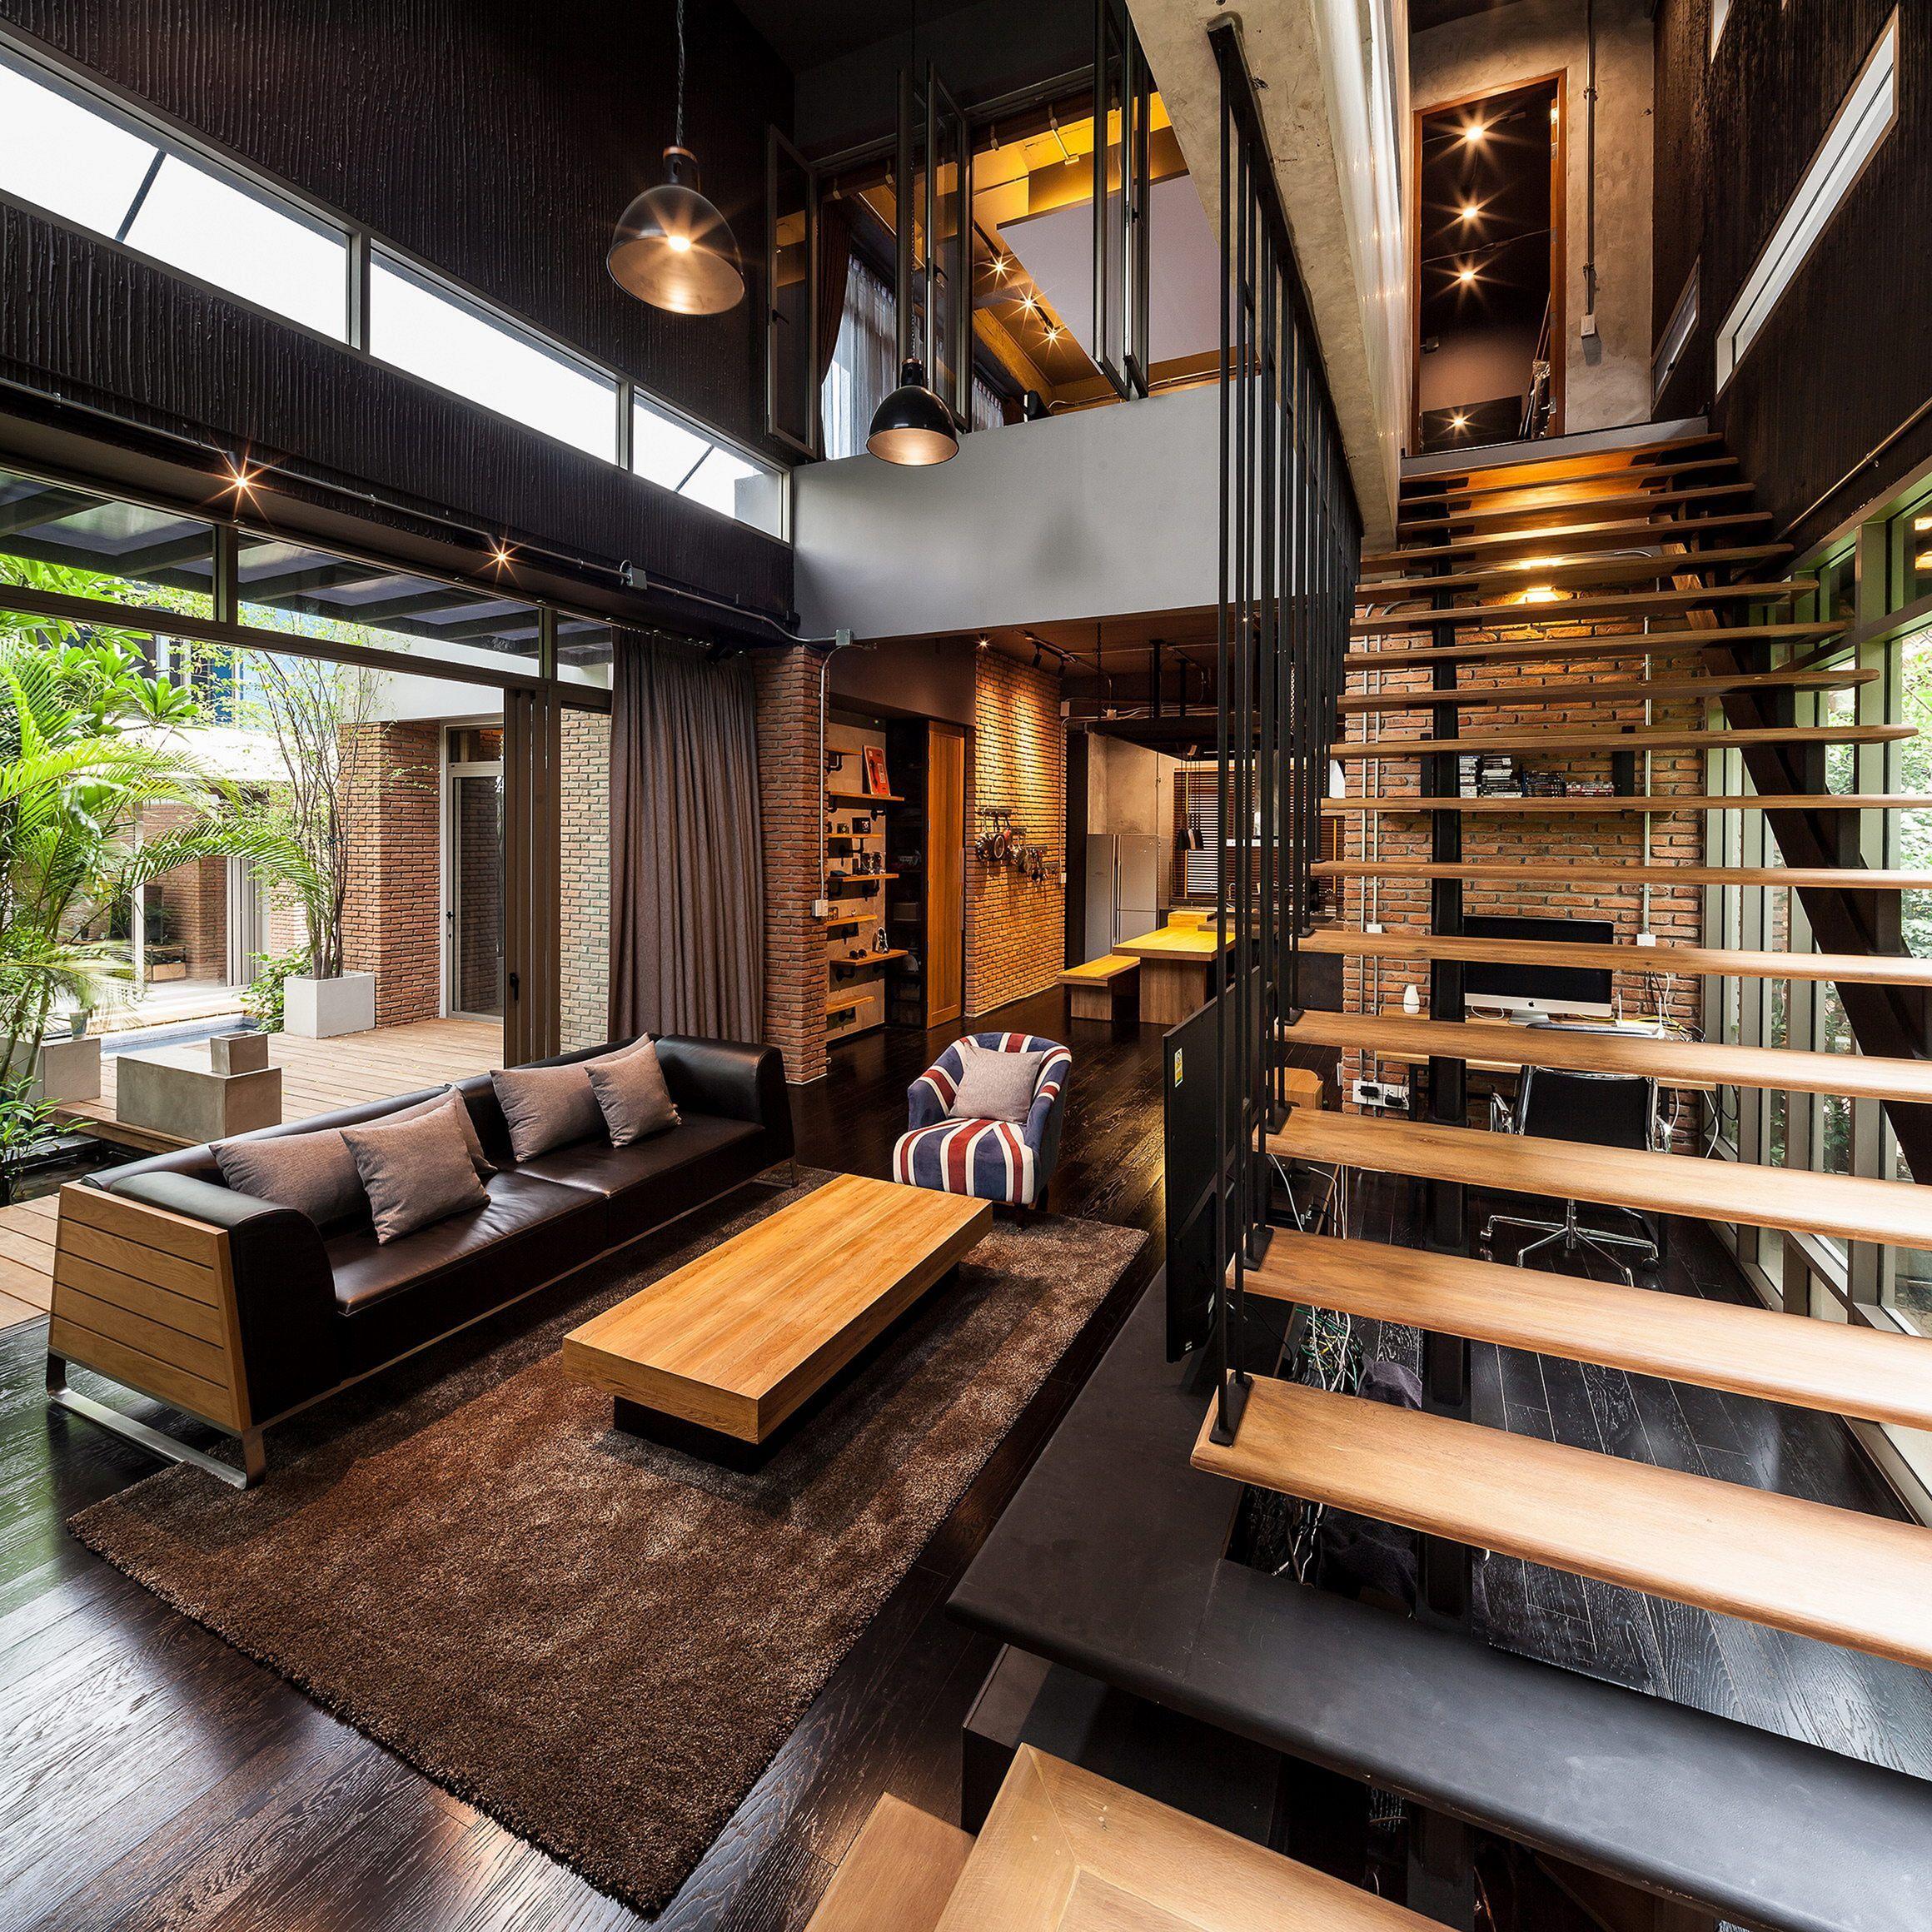 Top 22 Best And Cozy Industrial Home Decor That Inspires You Https Dsgndcr Com Home Decor Ideas Interior Architecture Design Modern House Design Loft Design